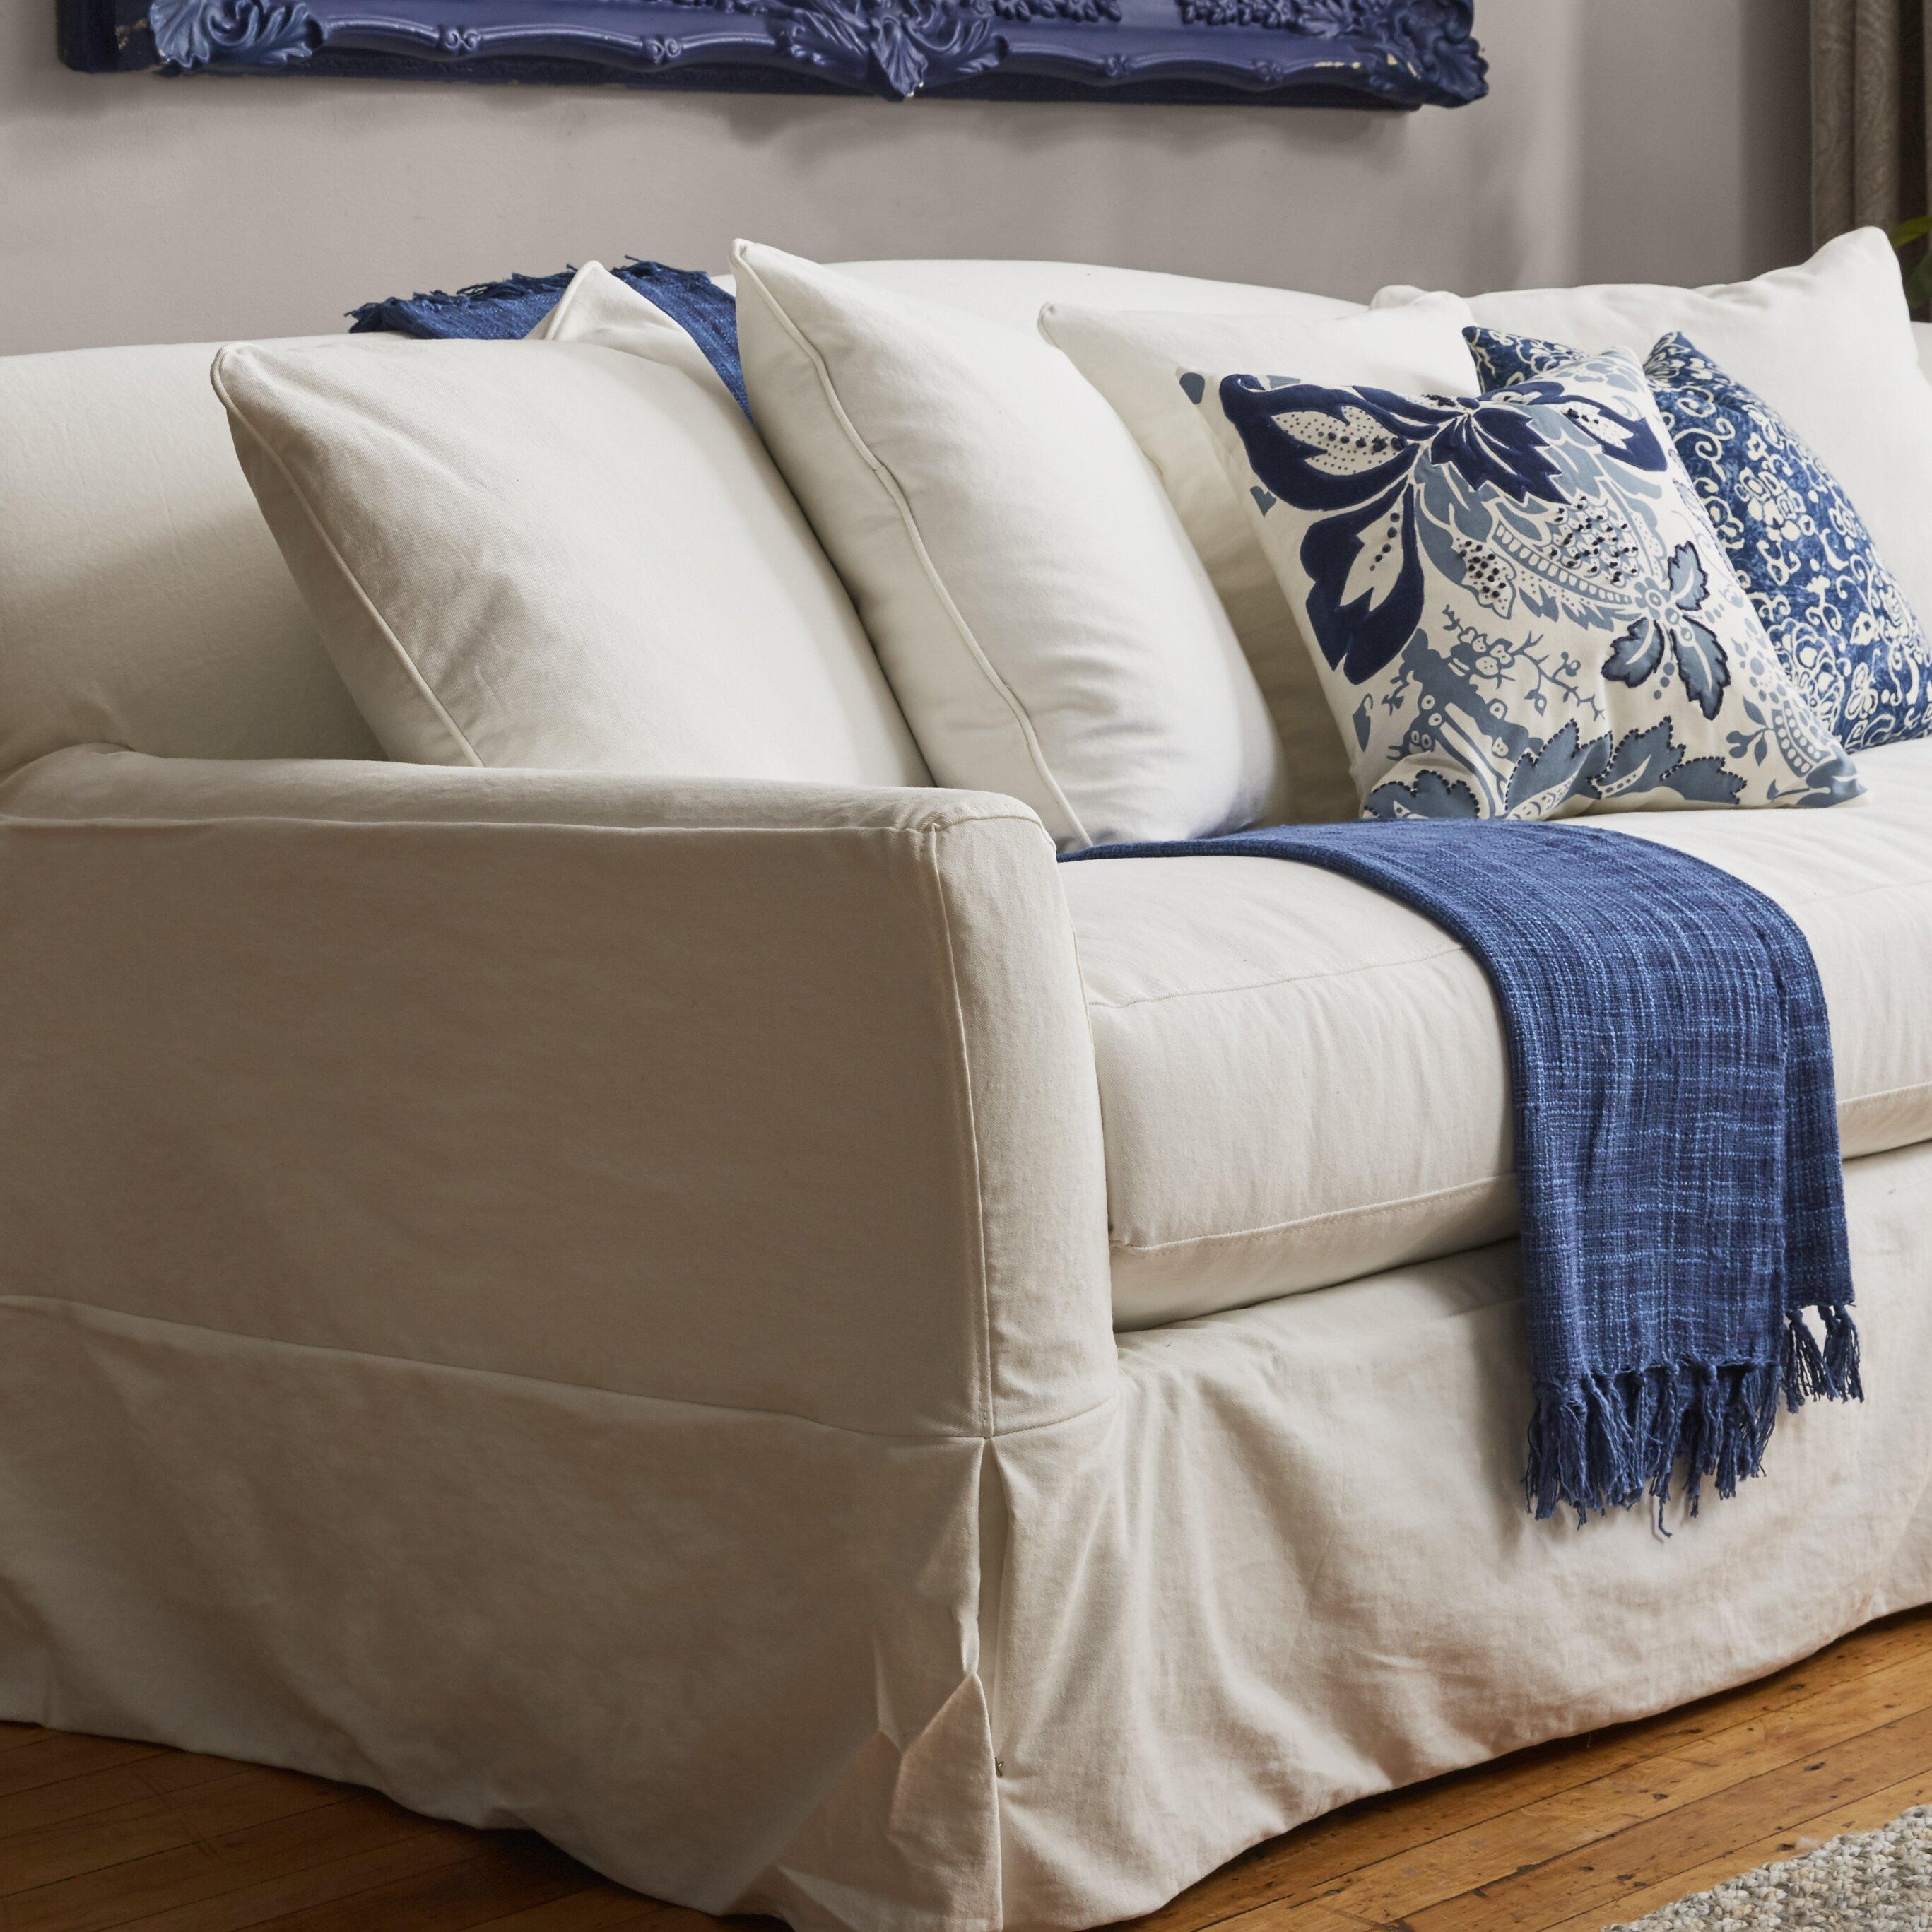 birch lane trade fairchild slipcovered sofa